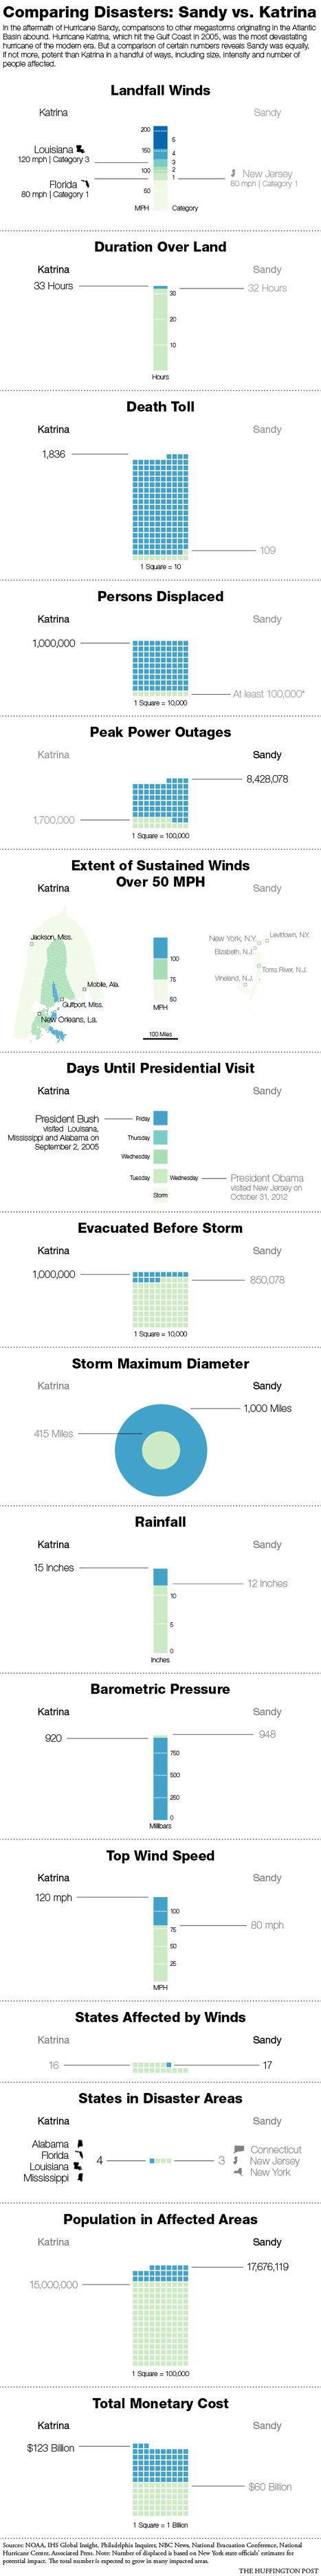 Comparing Hurricane Disasters: Sandy vs.Katrina | Top 5 Infographics | Scoop.it